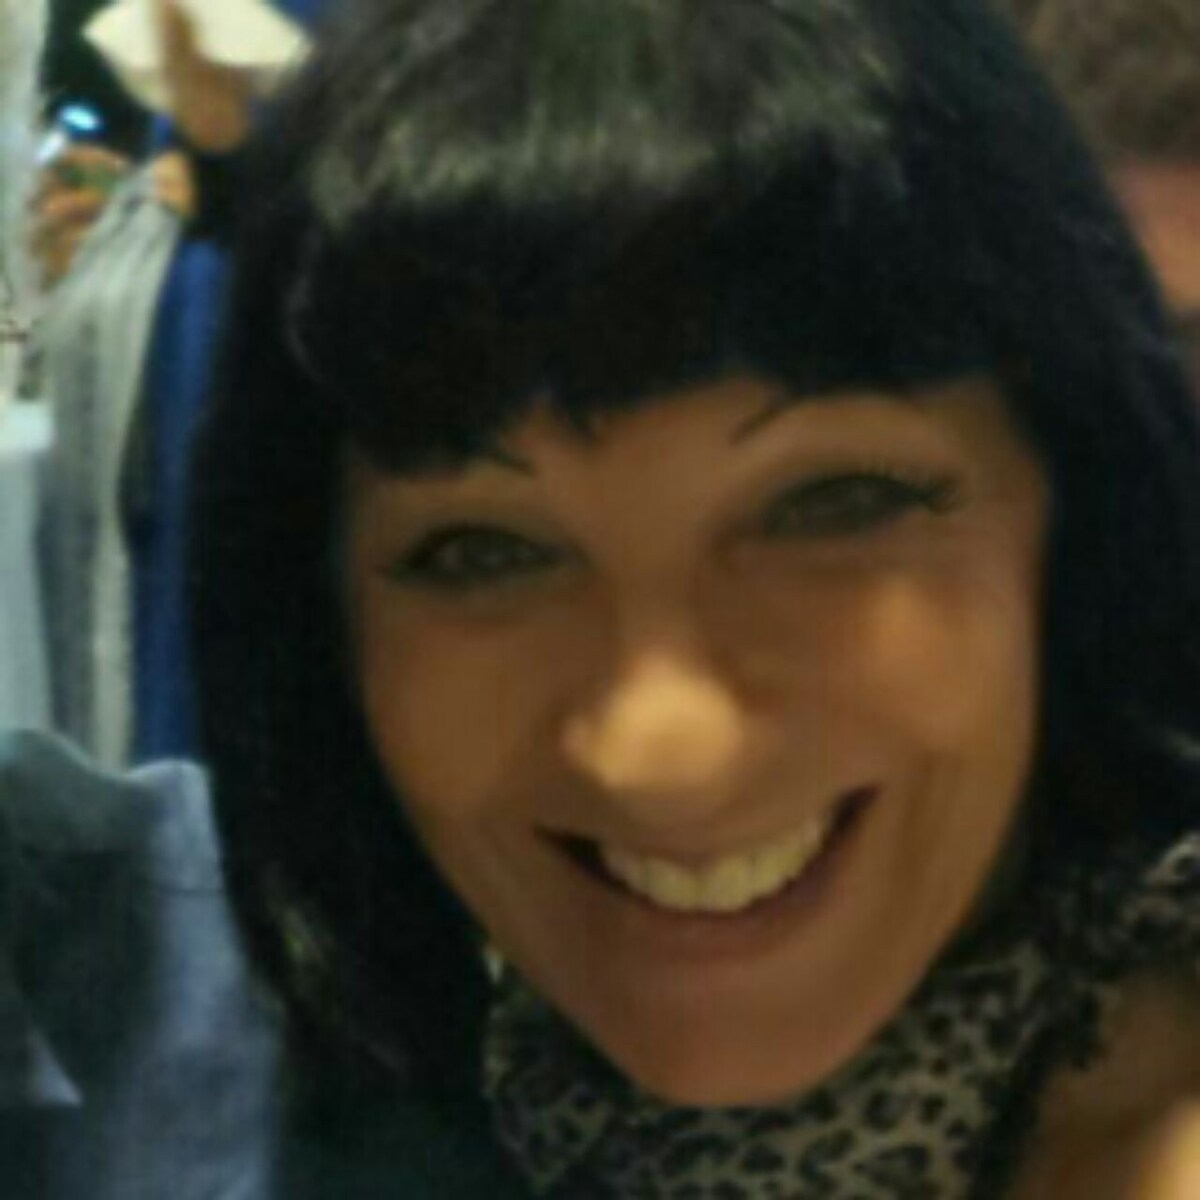 Brigitte From Munich, Germany